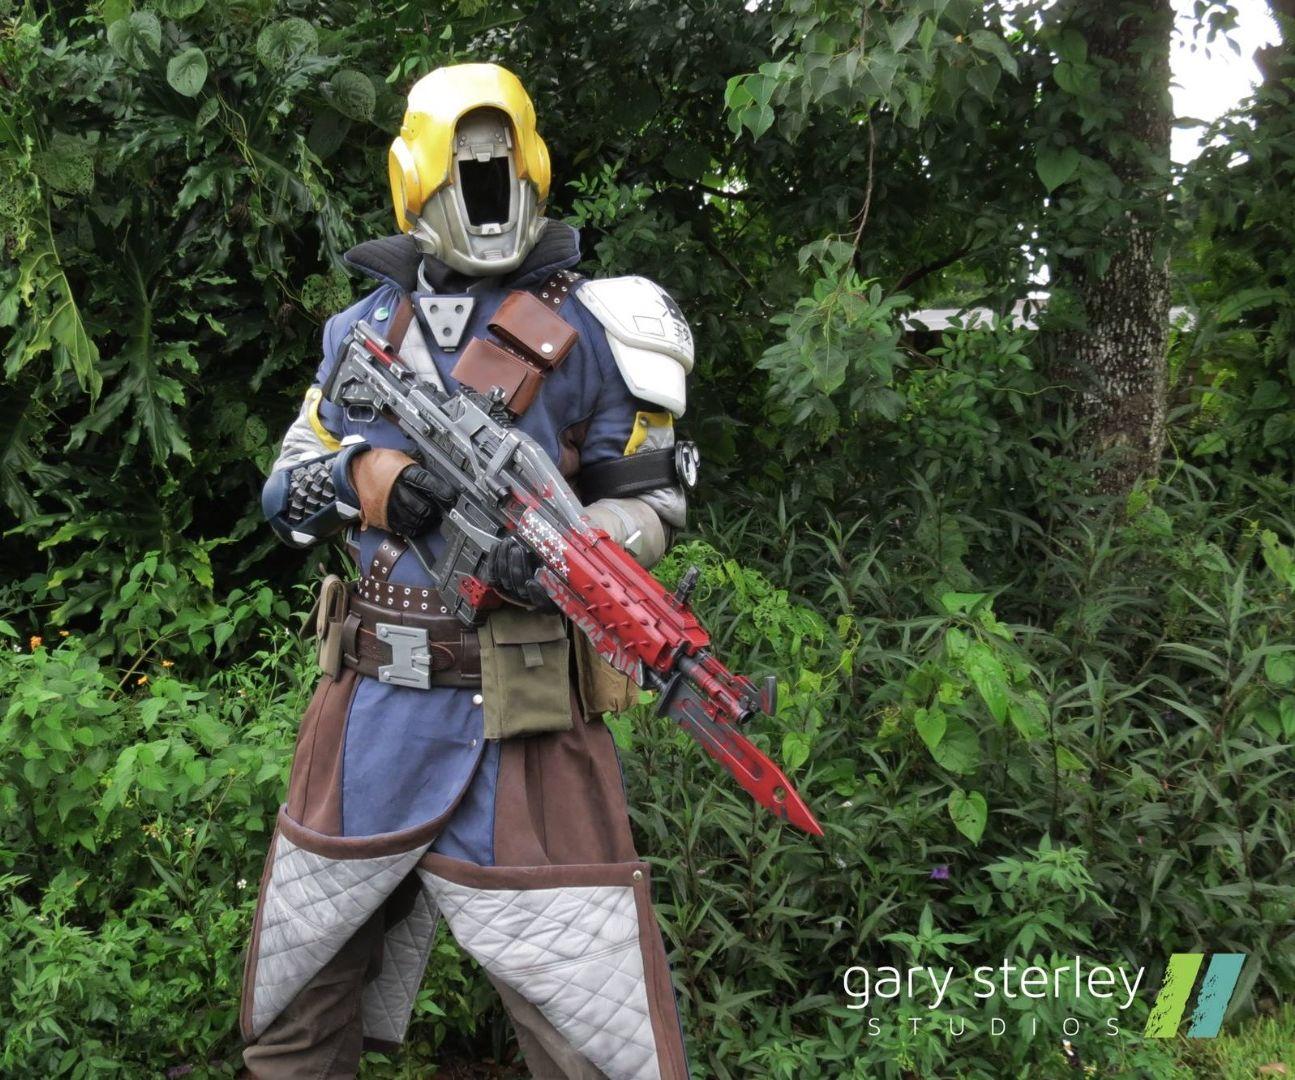 Destiny Warlock Costume by Gary Sterley